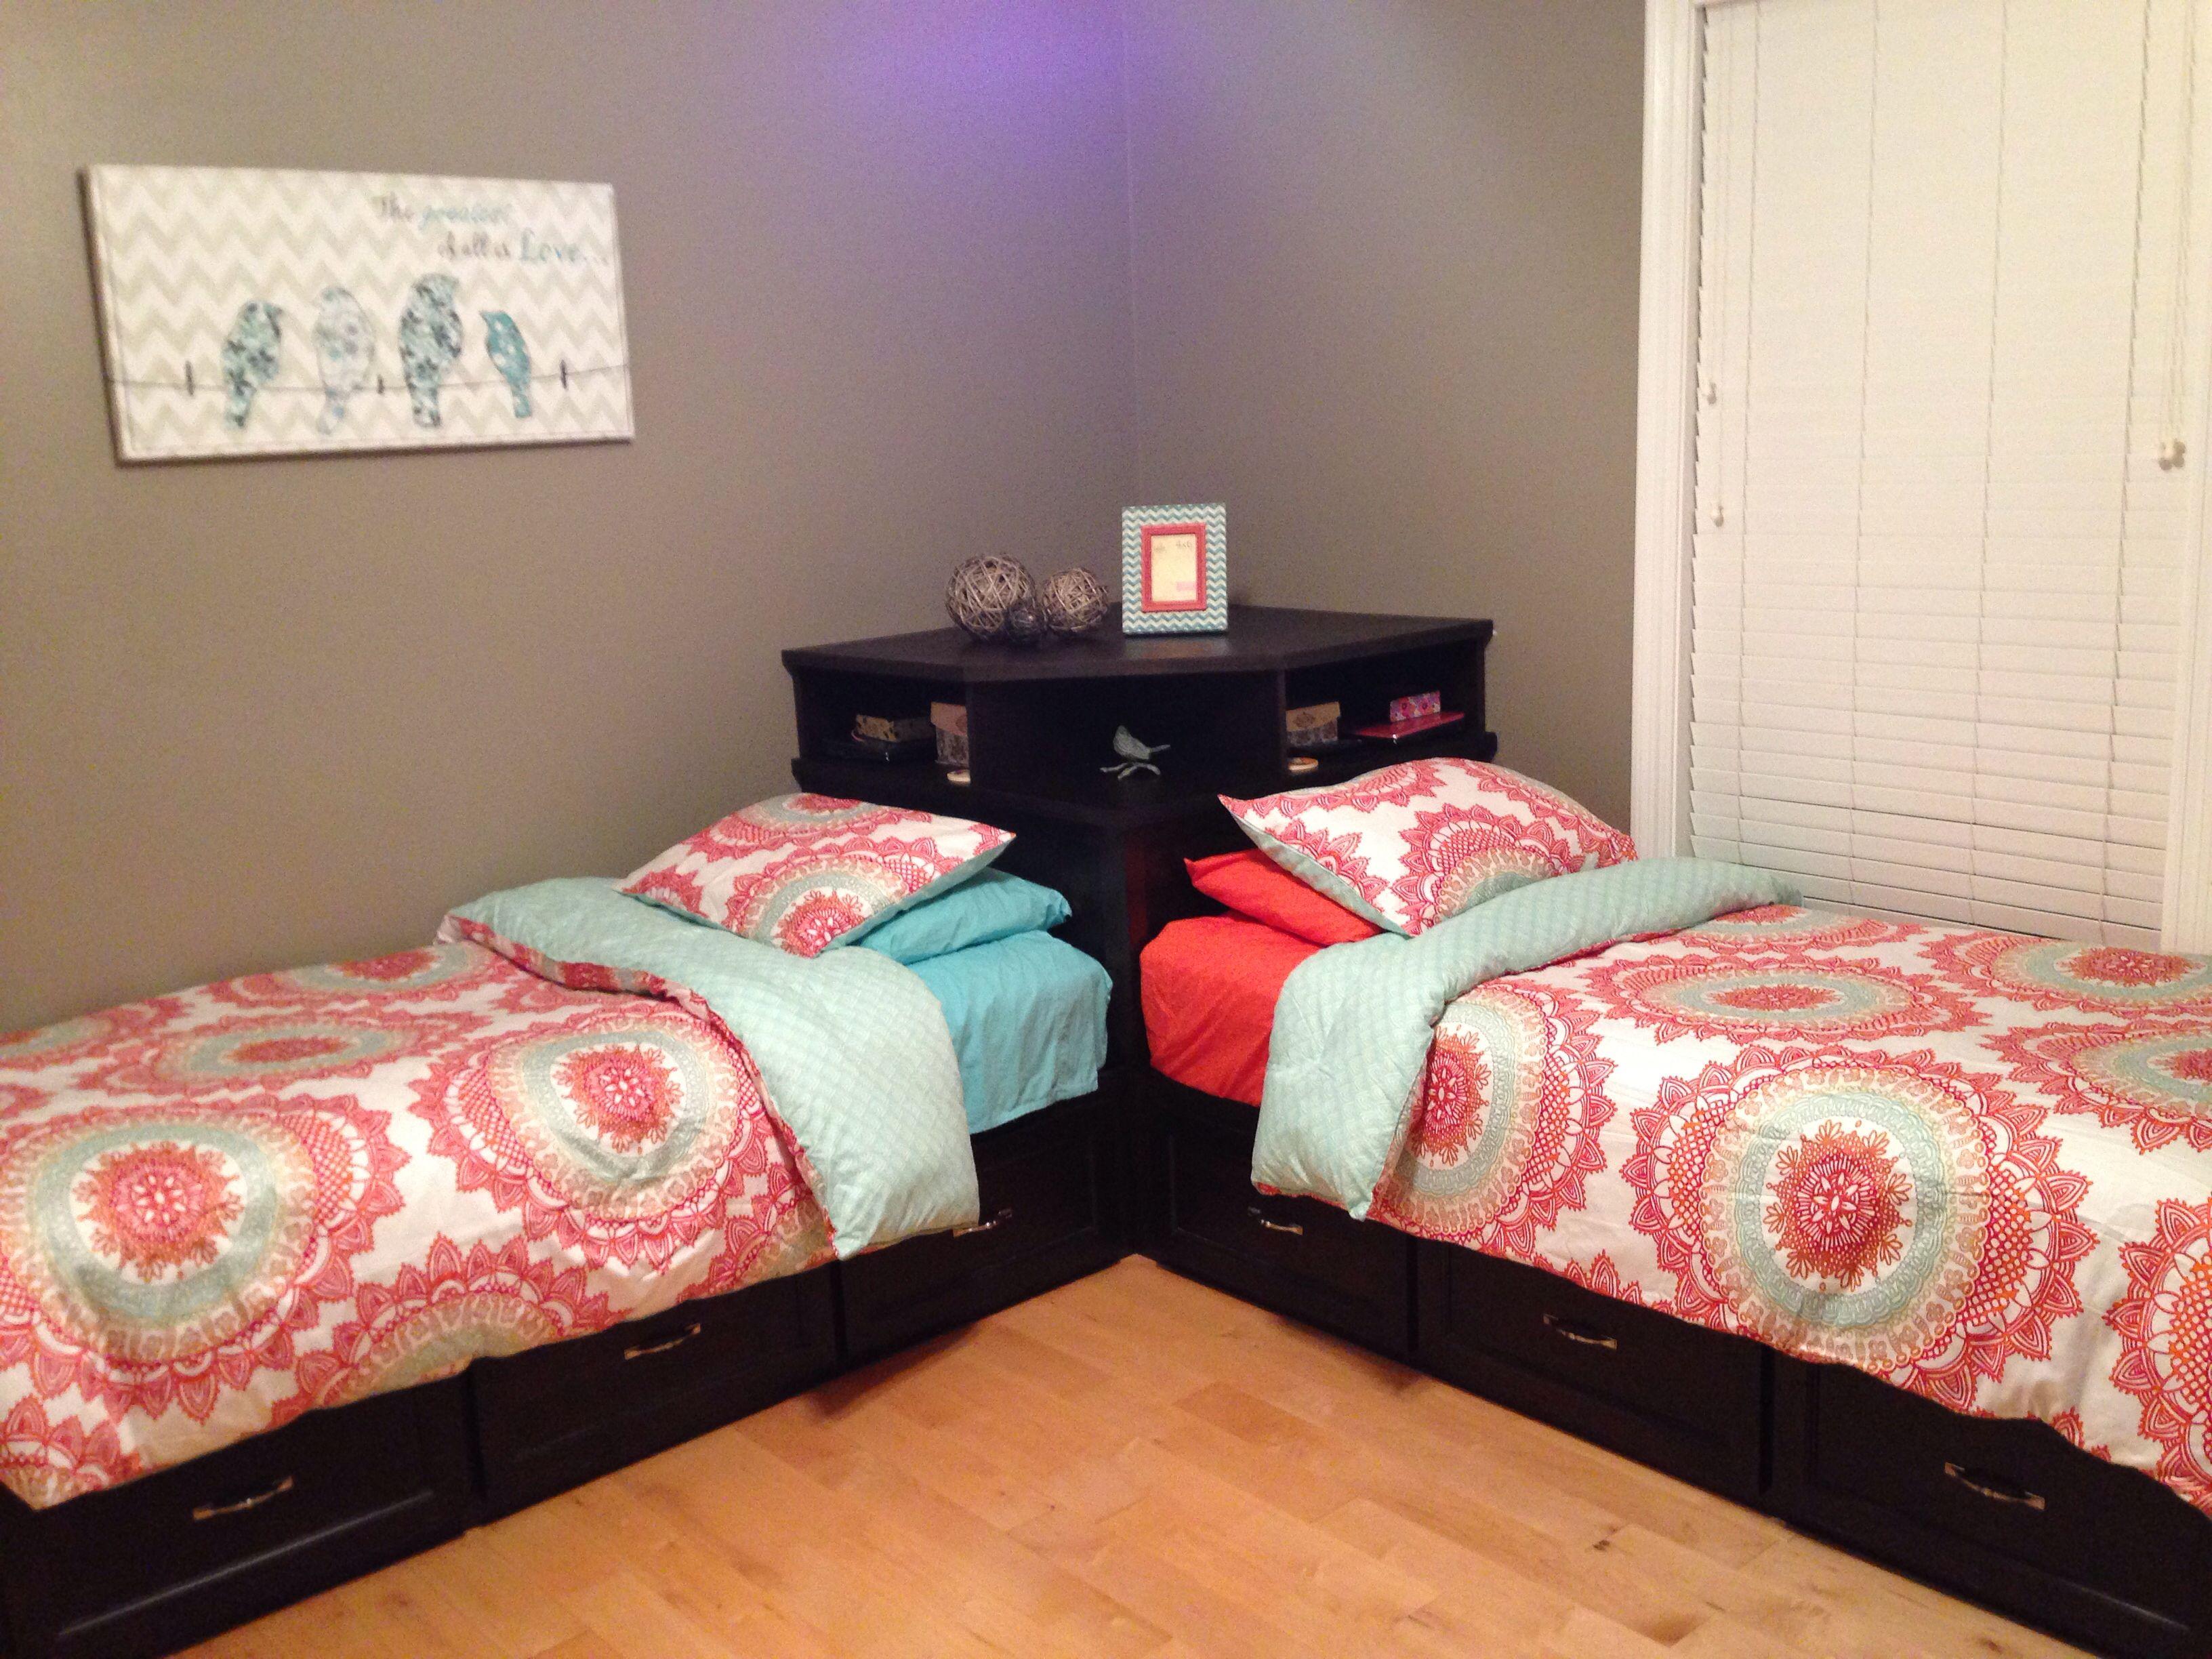 Pin on house stuff on Teenager:_L_Breseofm= Bedroom Ideas  id=94635